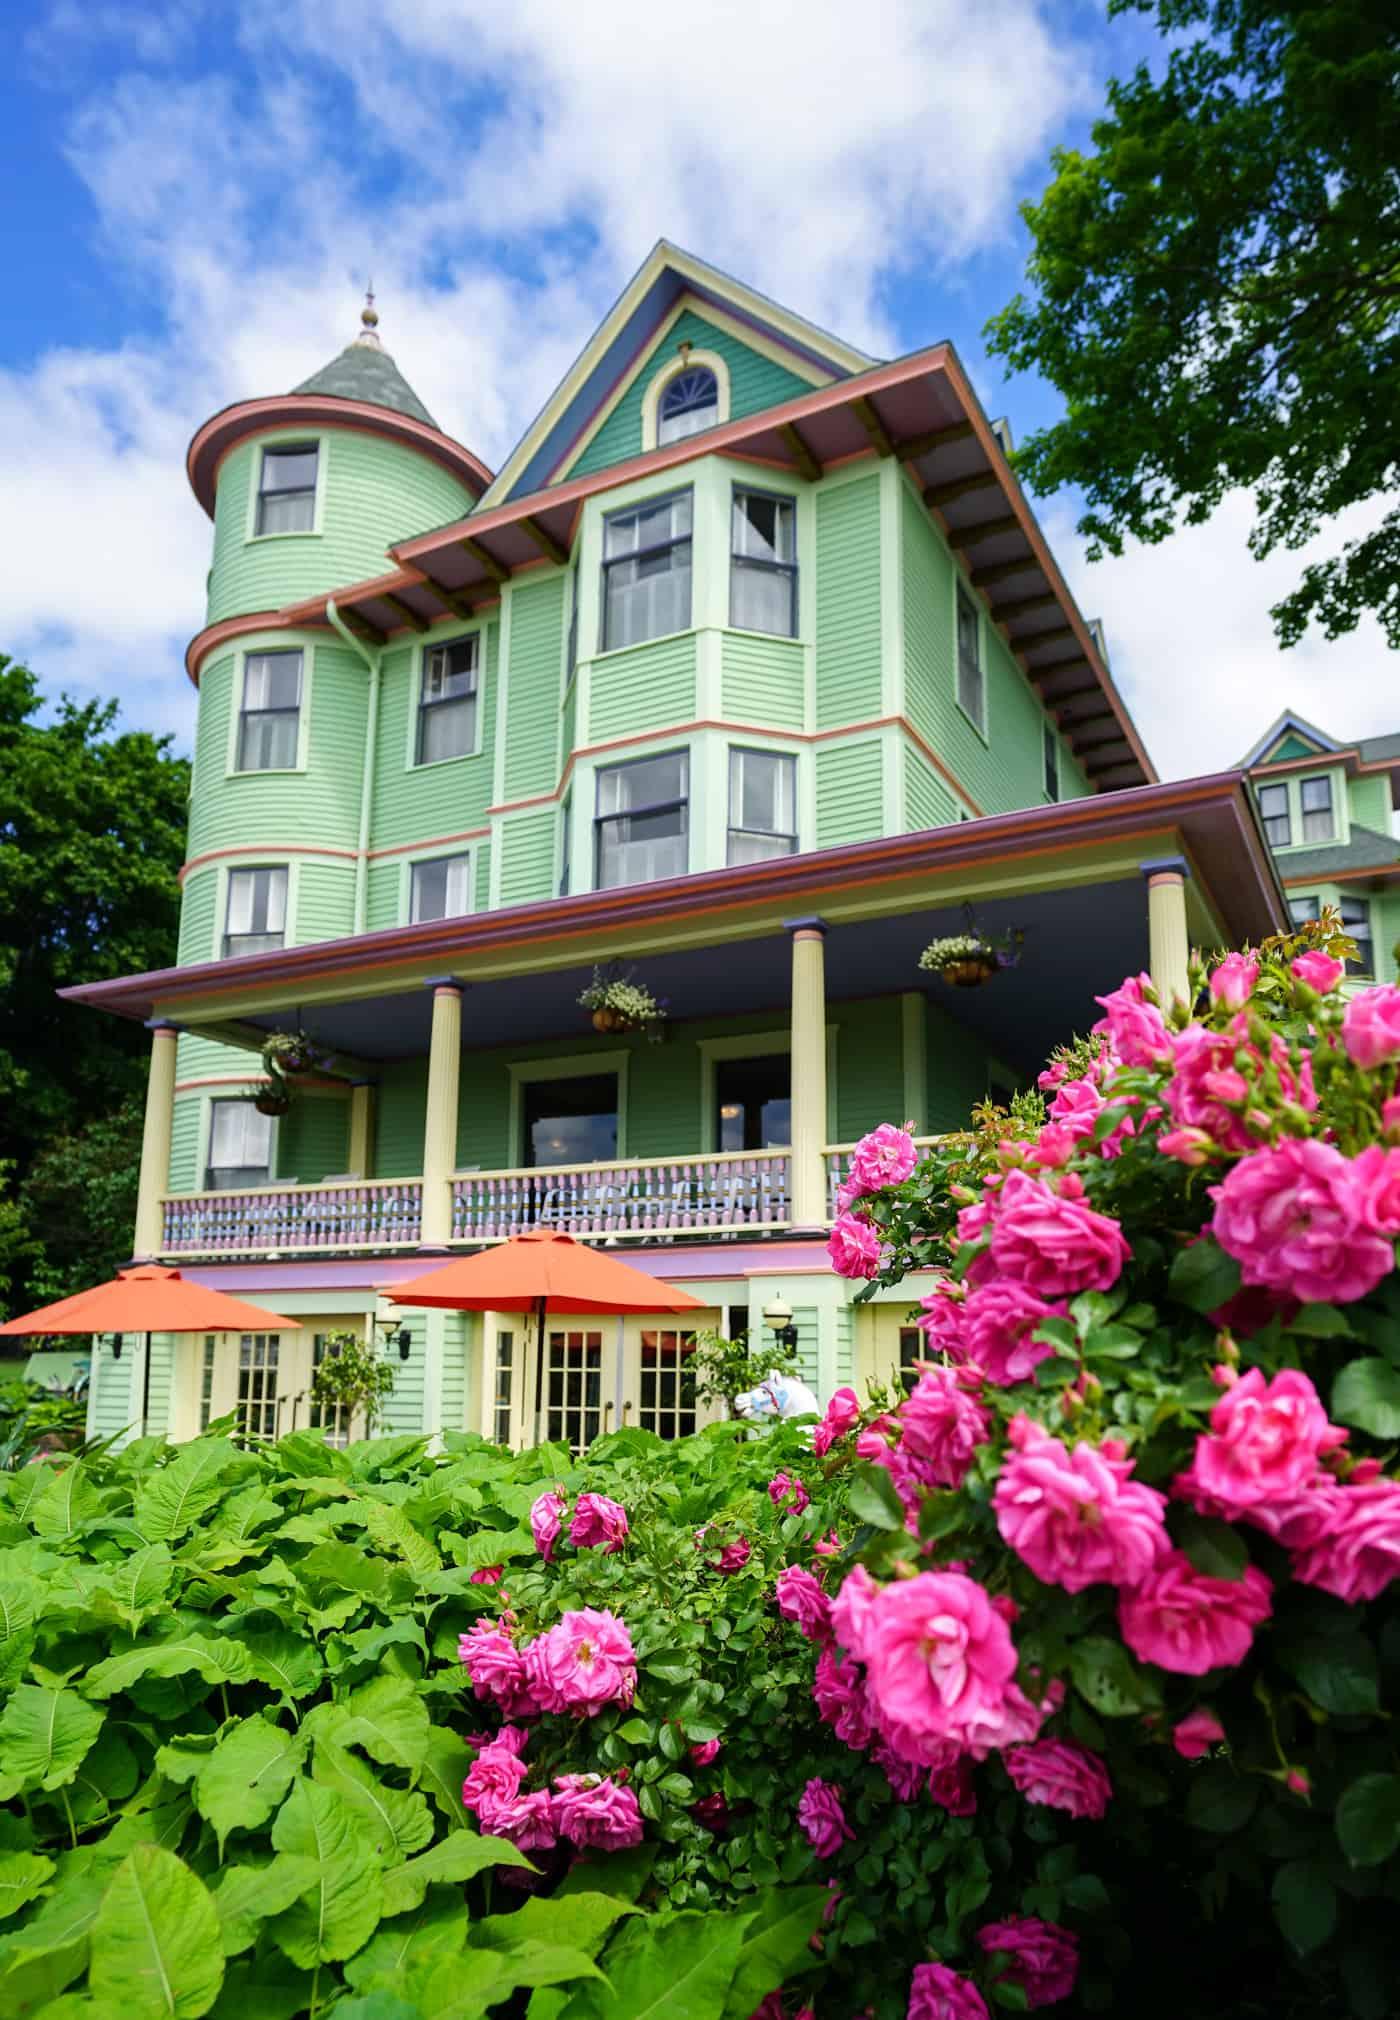 Inn on Mackinac on Mackinac Island Michigan